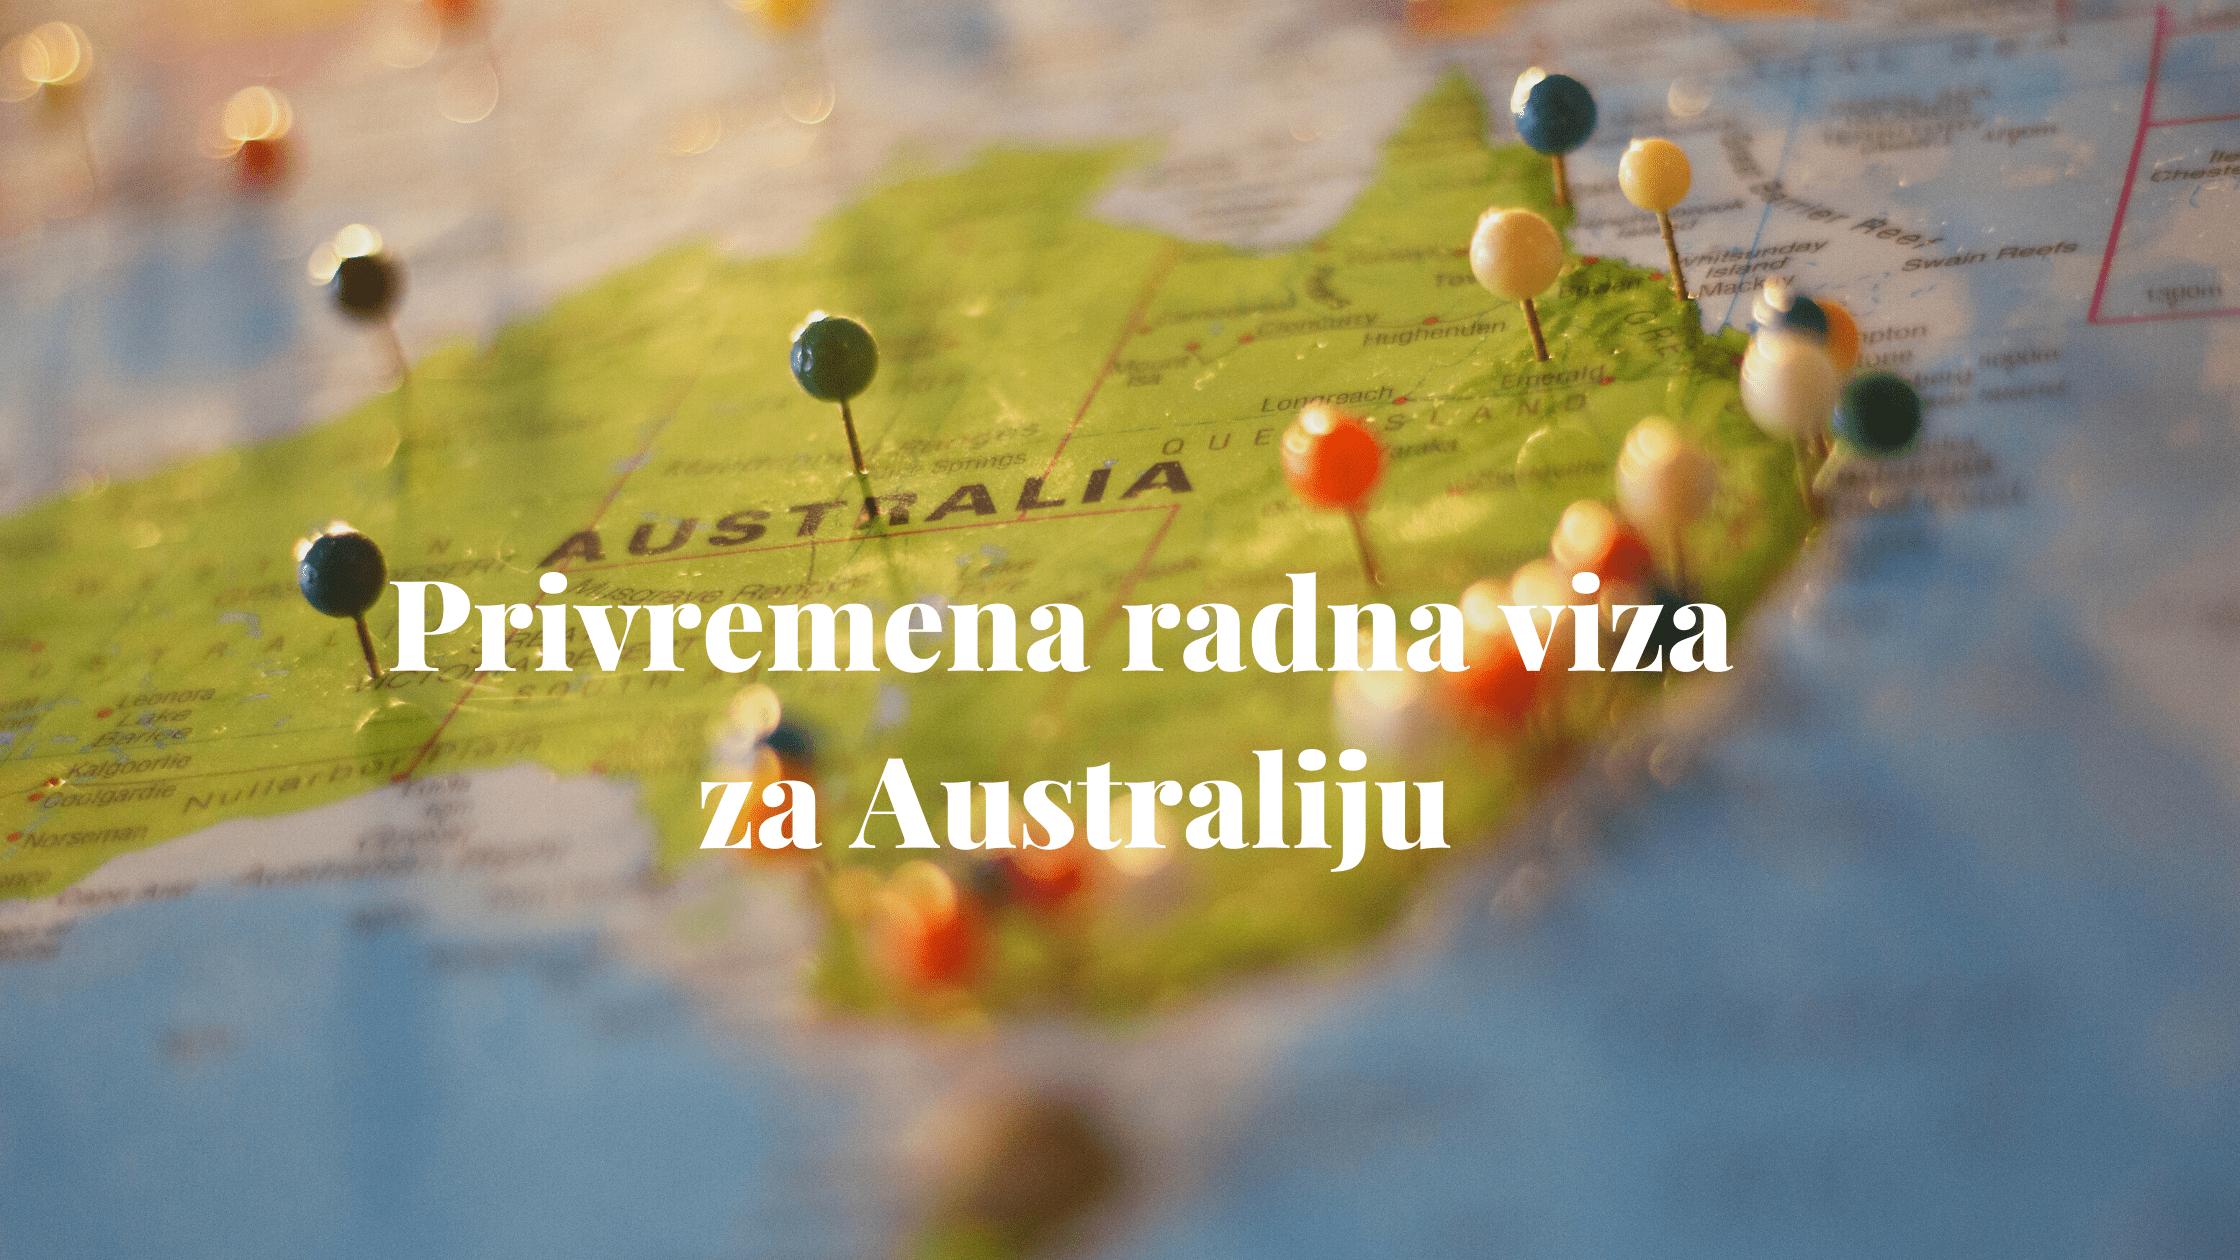 Privremena radna viza za Australiju 1